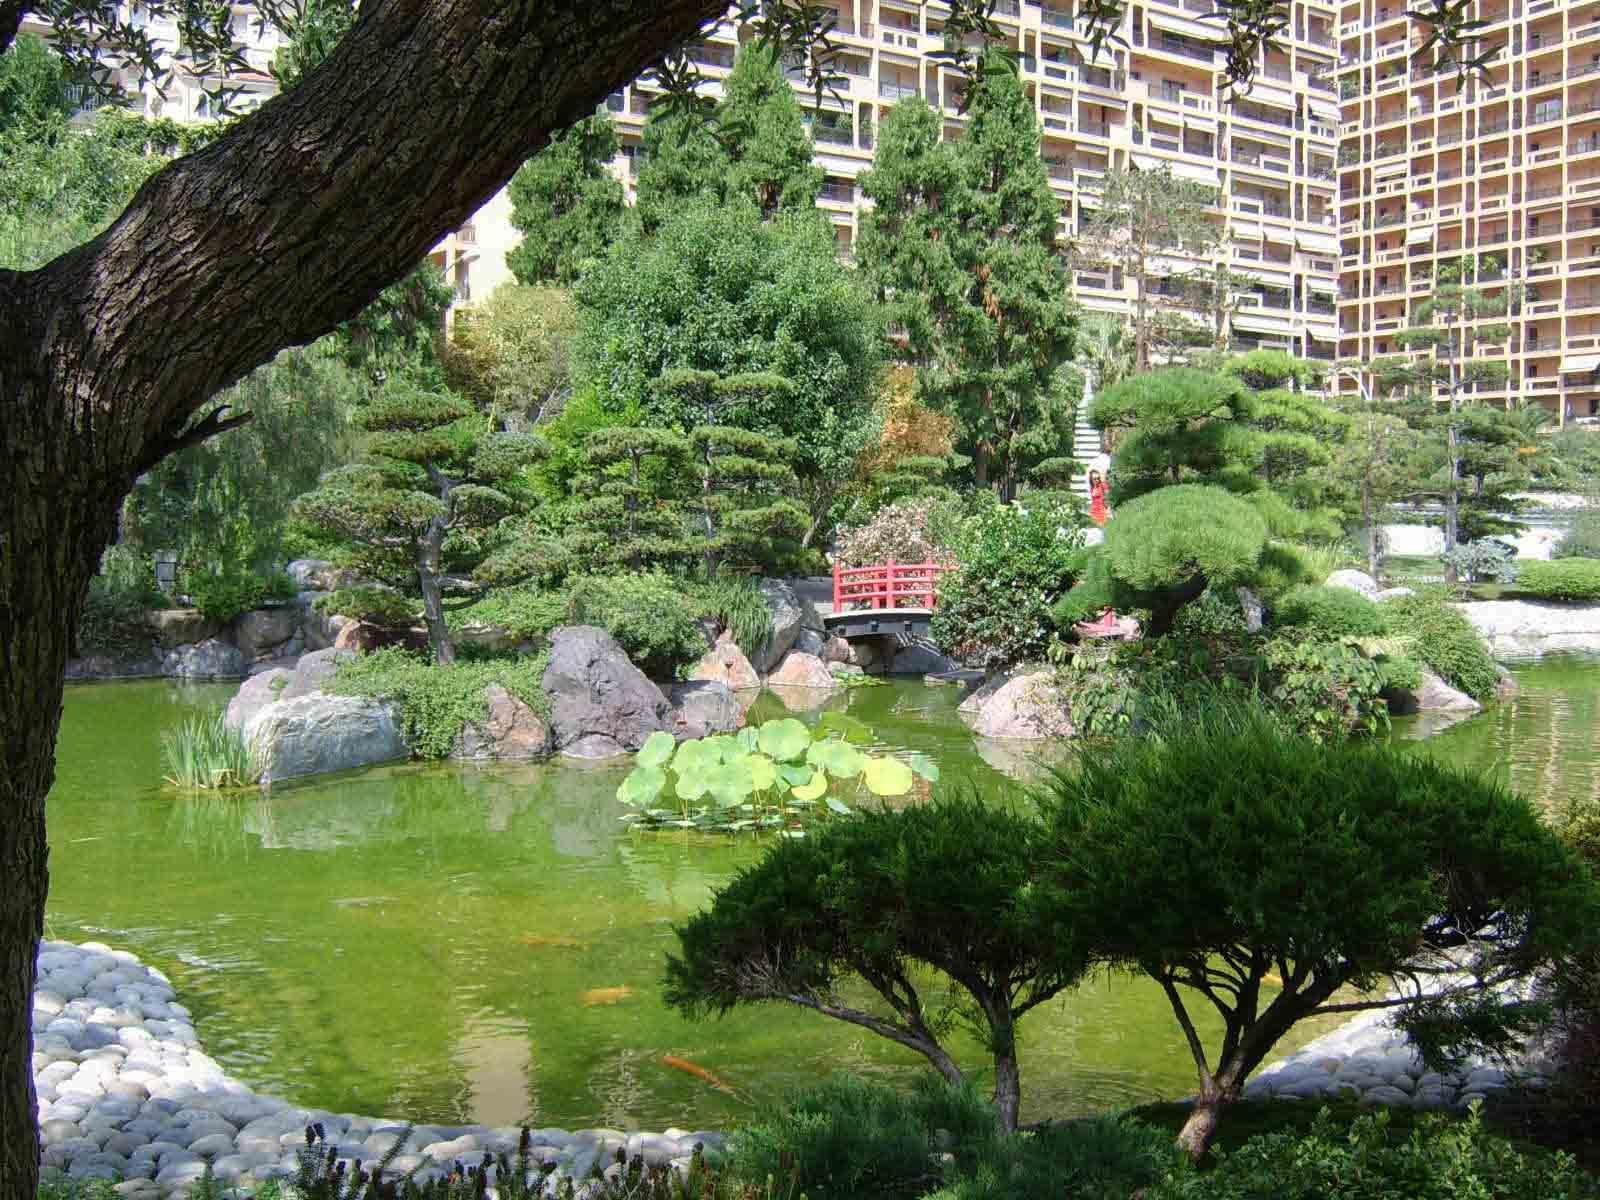 giardino giapponese_creareverde_08 - Creare Verde